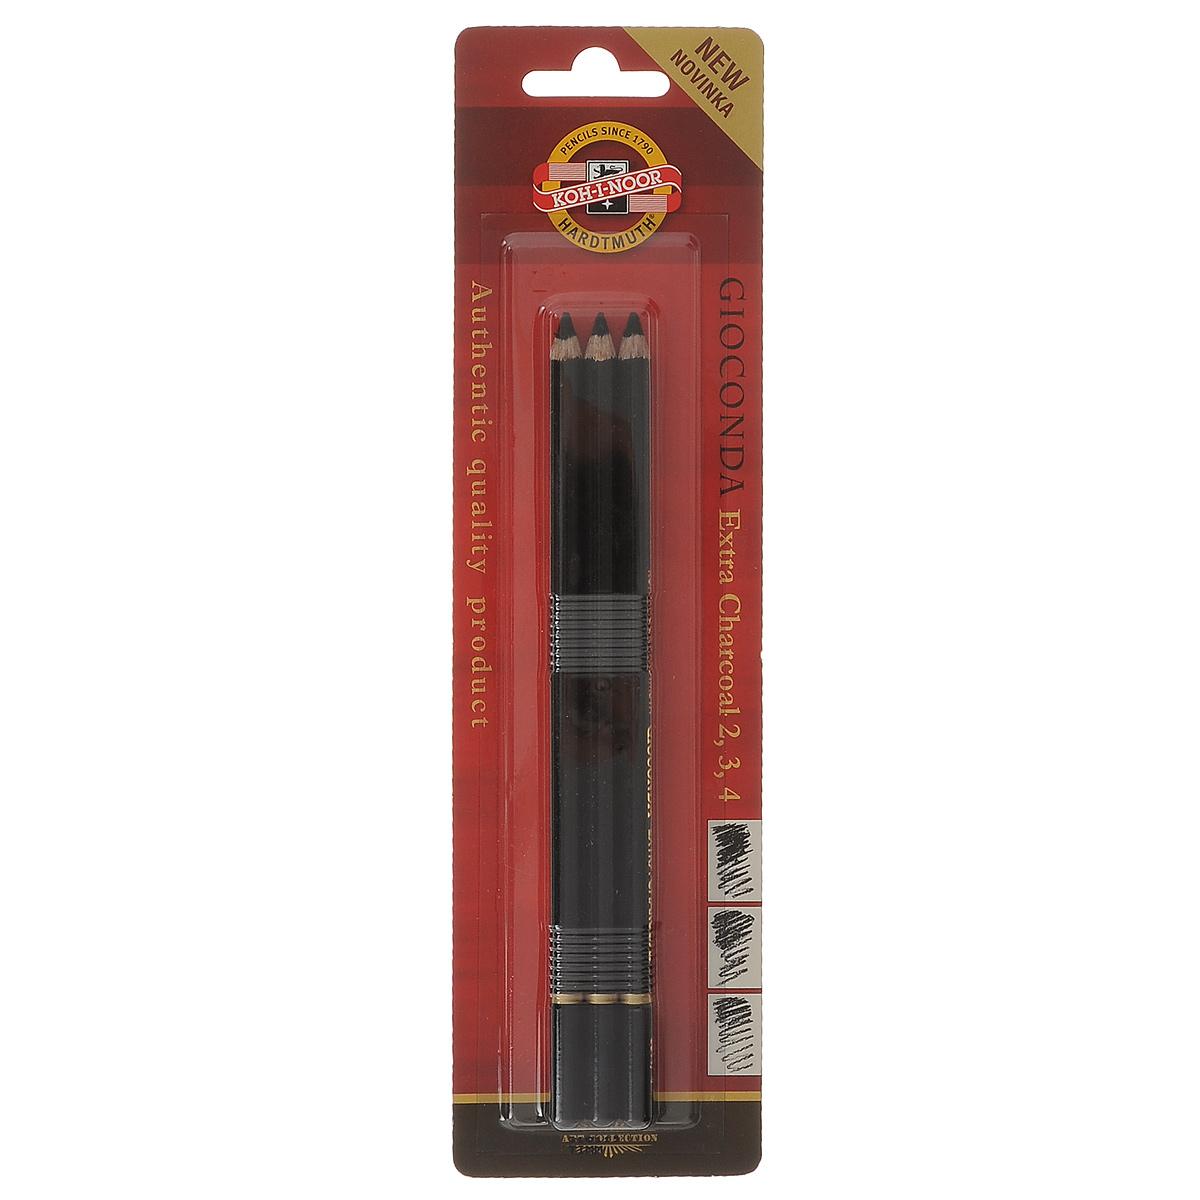 цены Набор угольных карандашей Koh-i-Noor